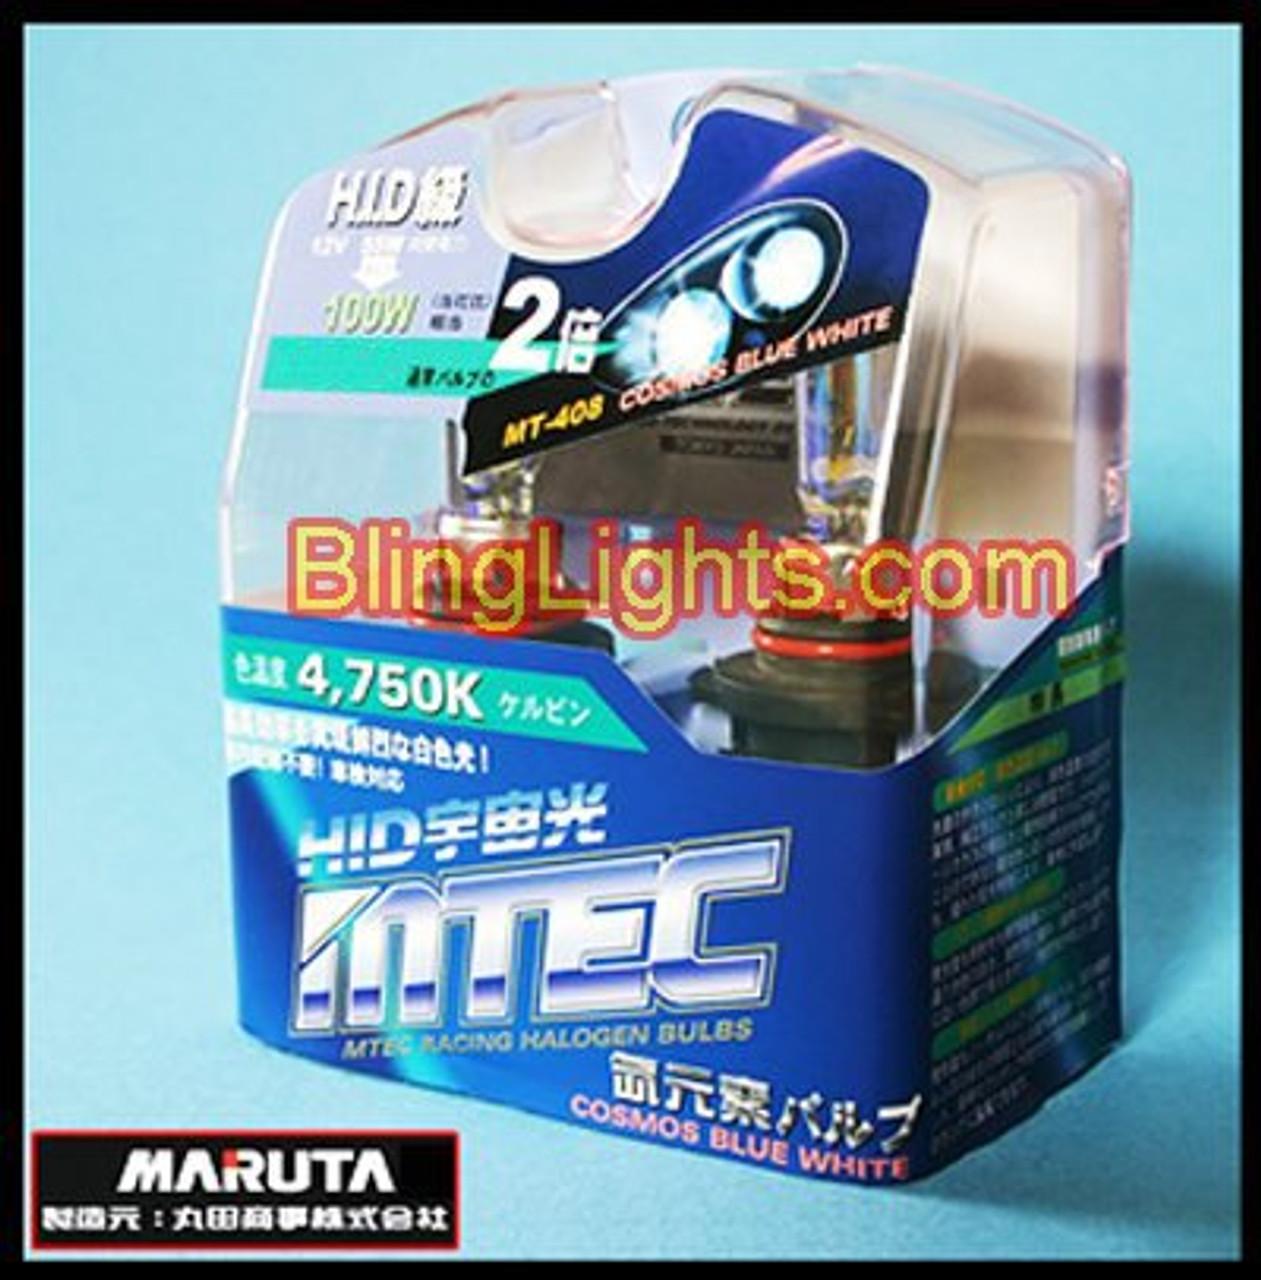 1992 1993 1994 1995 1996 1997 1998 Alfa Romeo 155 Bright White Light Bulbs for Headlamps Headlights